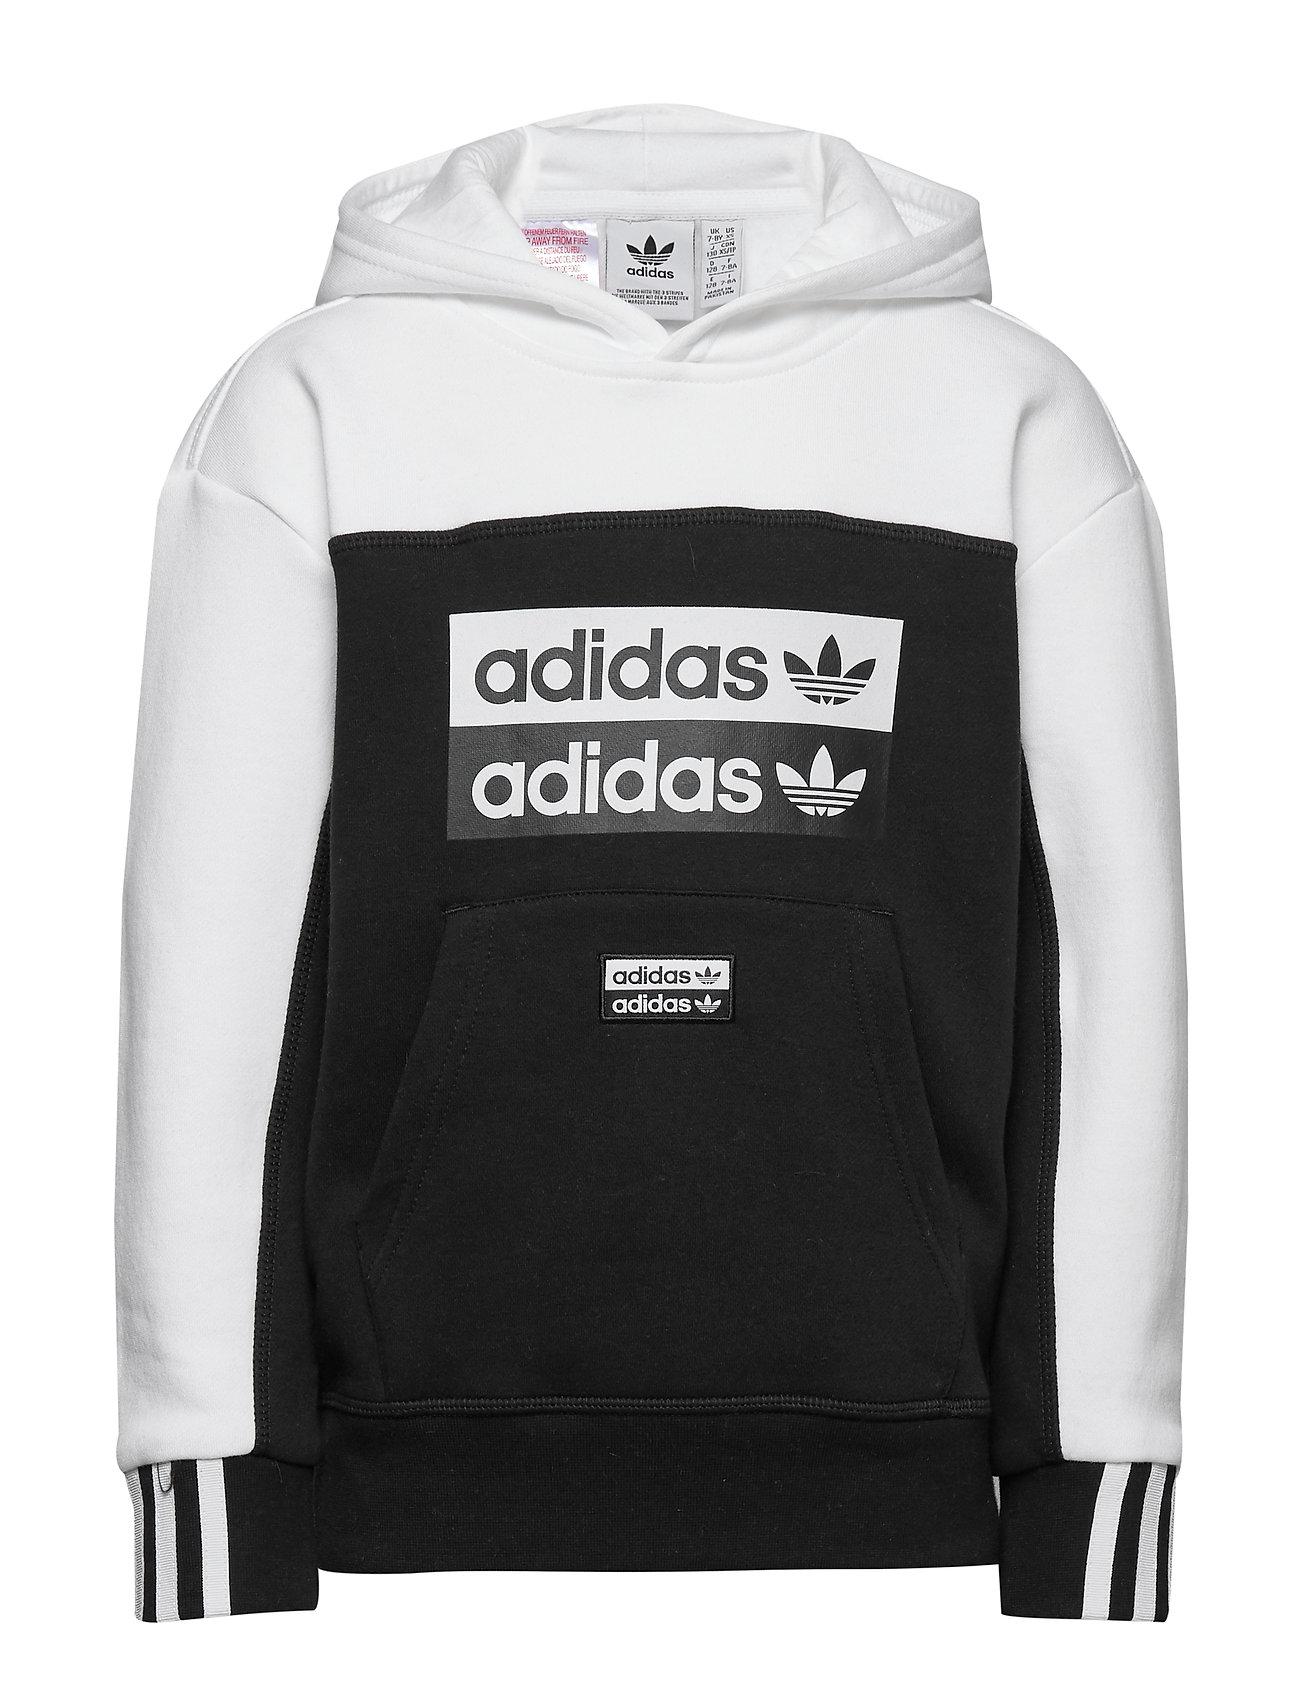 adidas Originals HOODIE - BLACK/WHITE